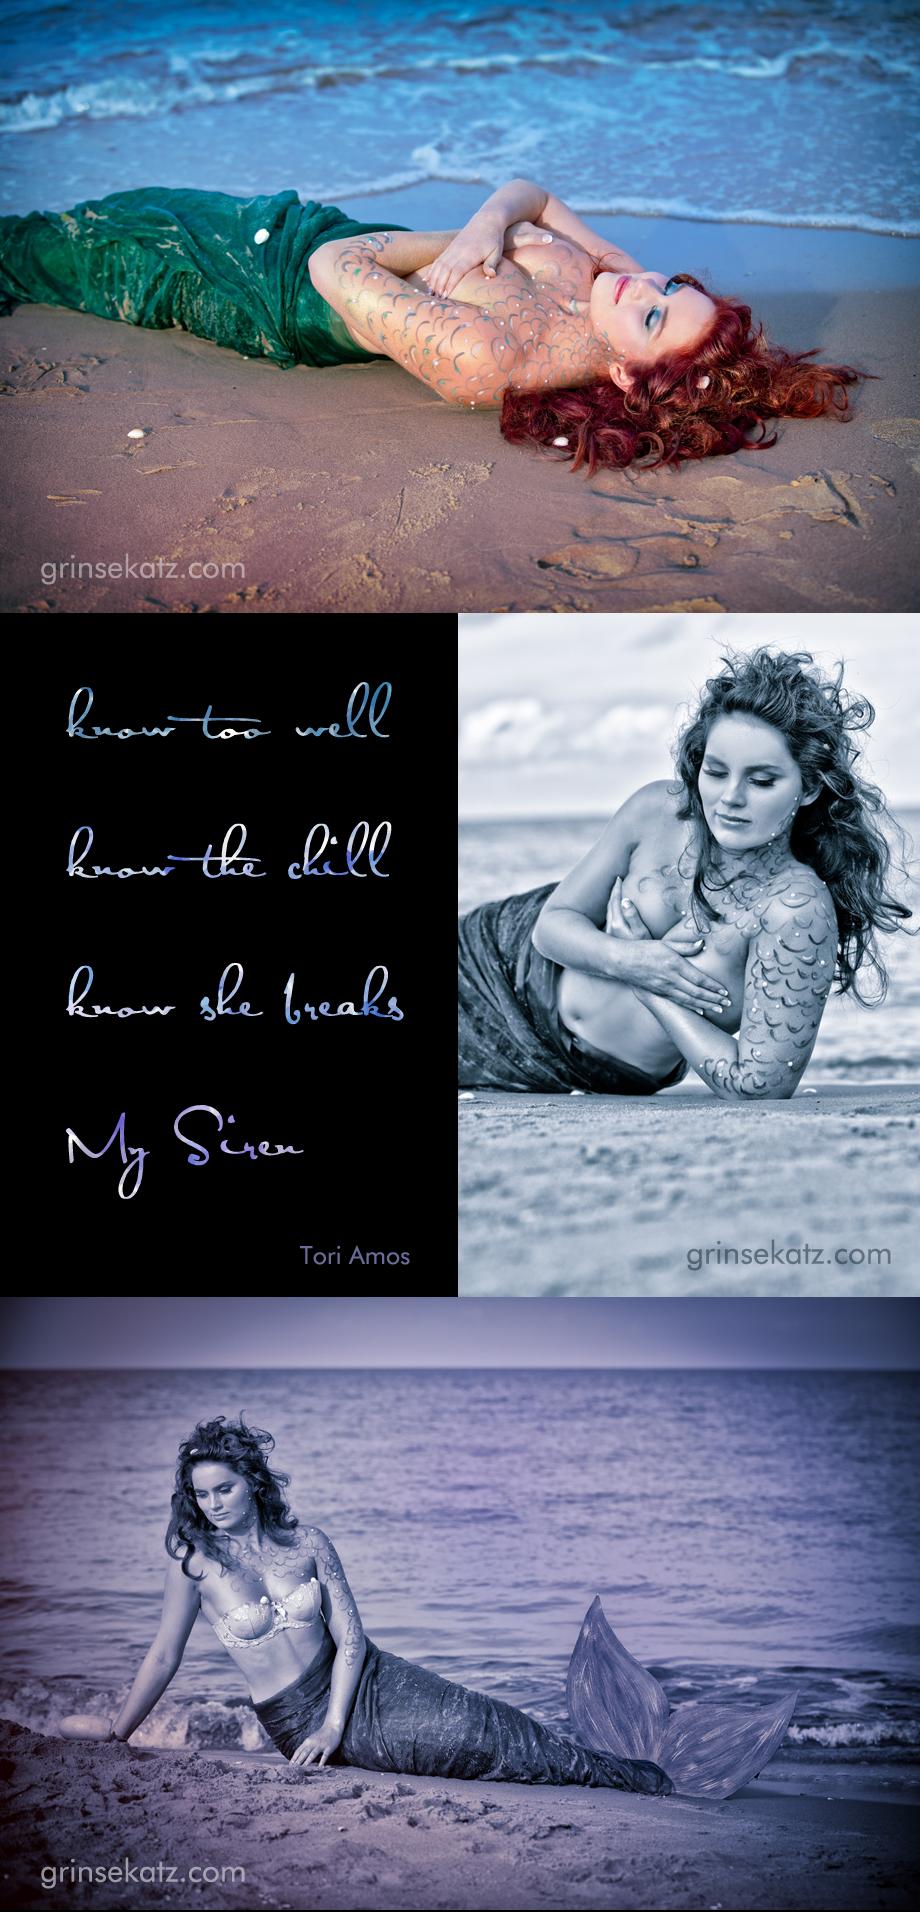 fotograf-usedom-ostsee-strandfotos-grinsekatz